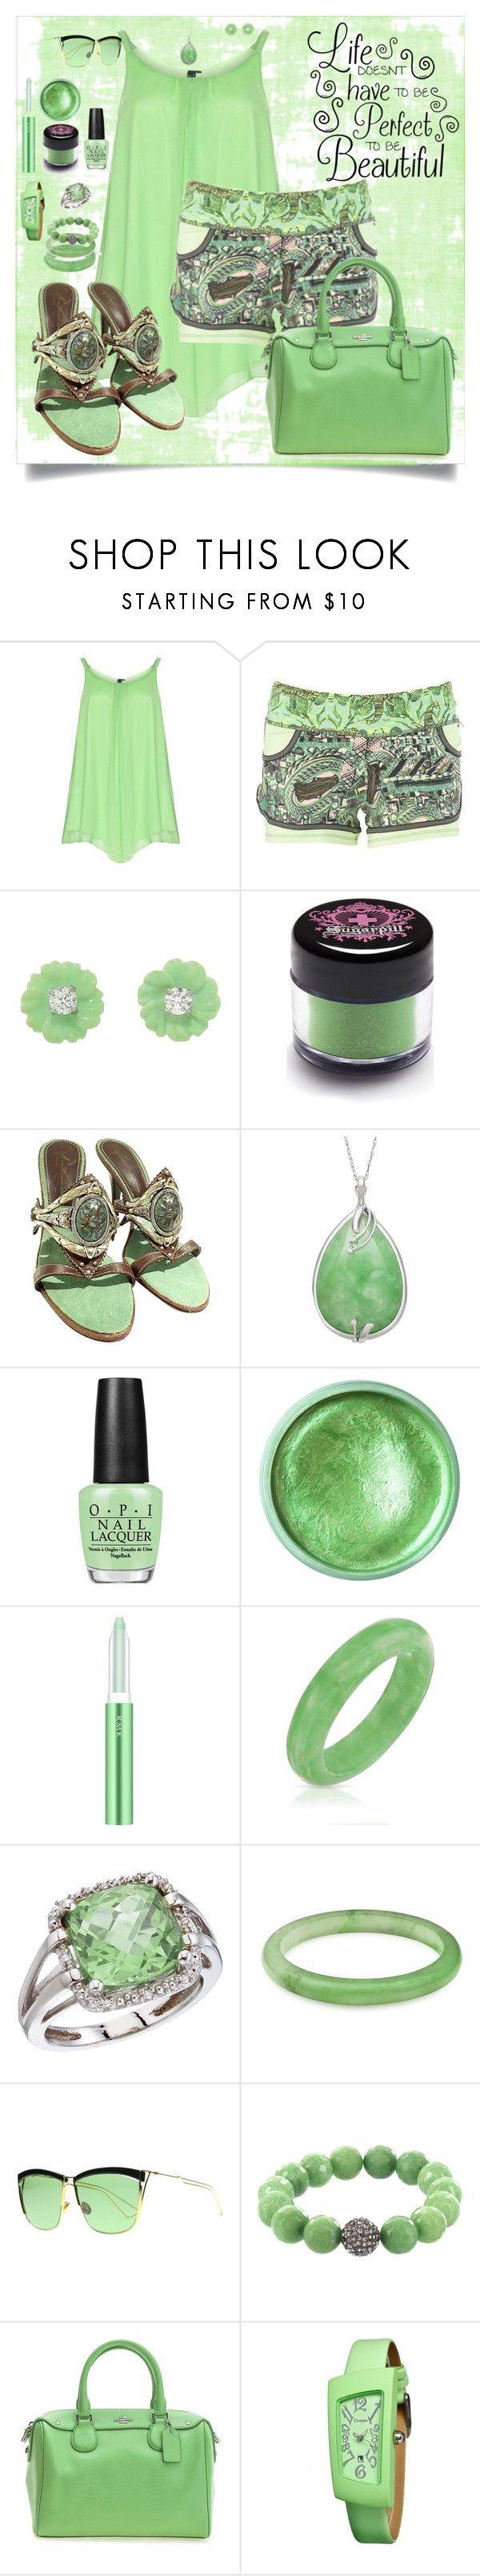 """Leaf greens"" by designcat-colour ❤ liked on Polyvore featuring Yoek, Irene Neuwirth, Sugarpill, Giuseppe Zanotti, OPI, RMK, Bling Jewelry, BillyTheTree, Christian Dior and Crayo"